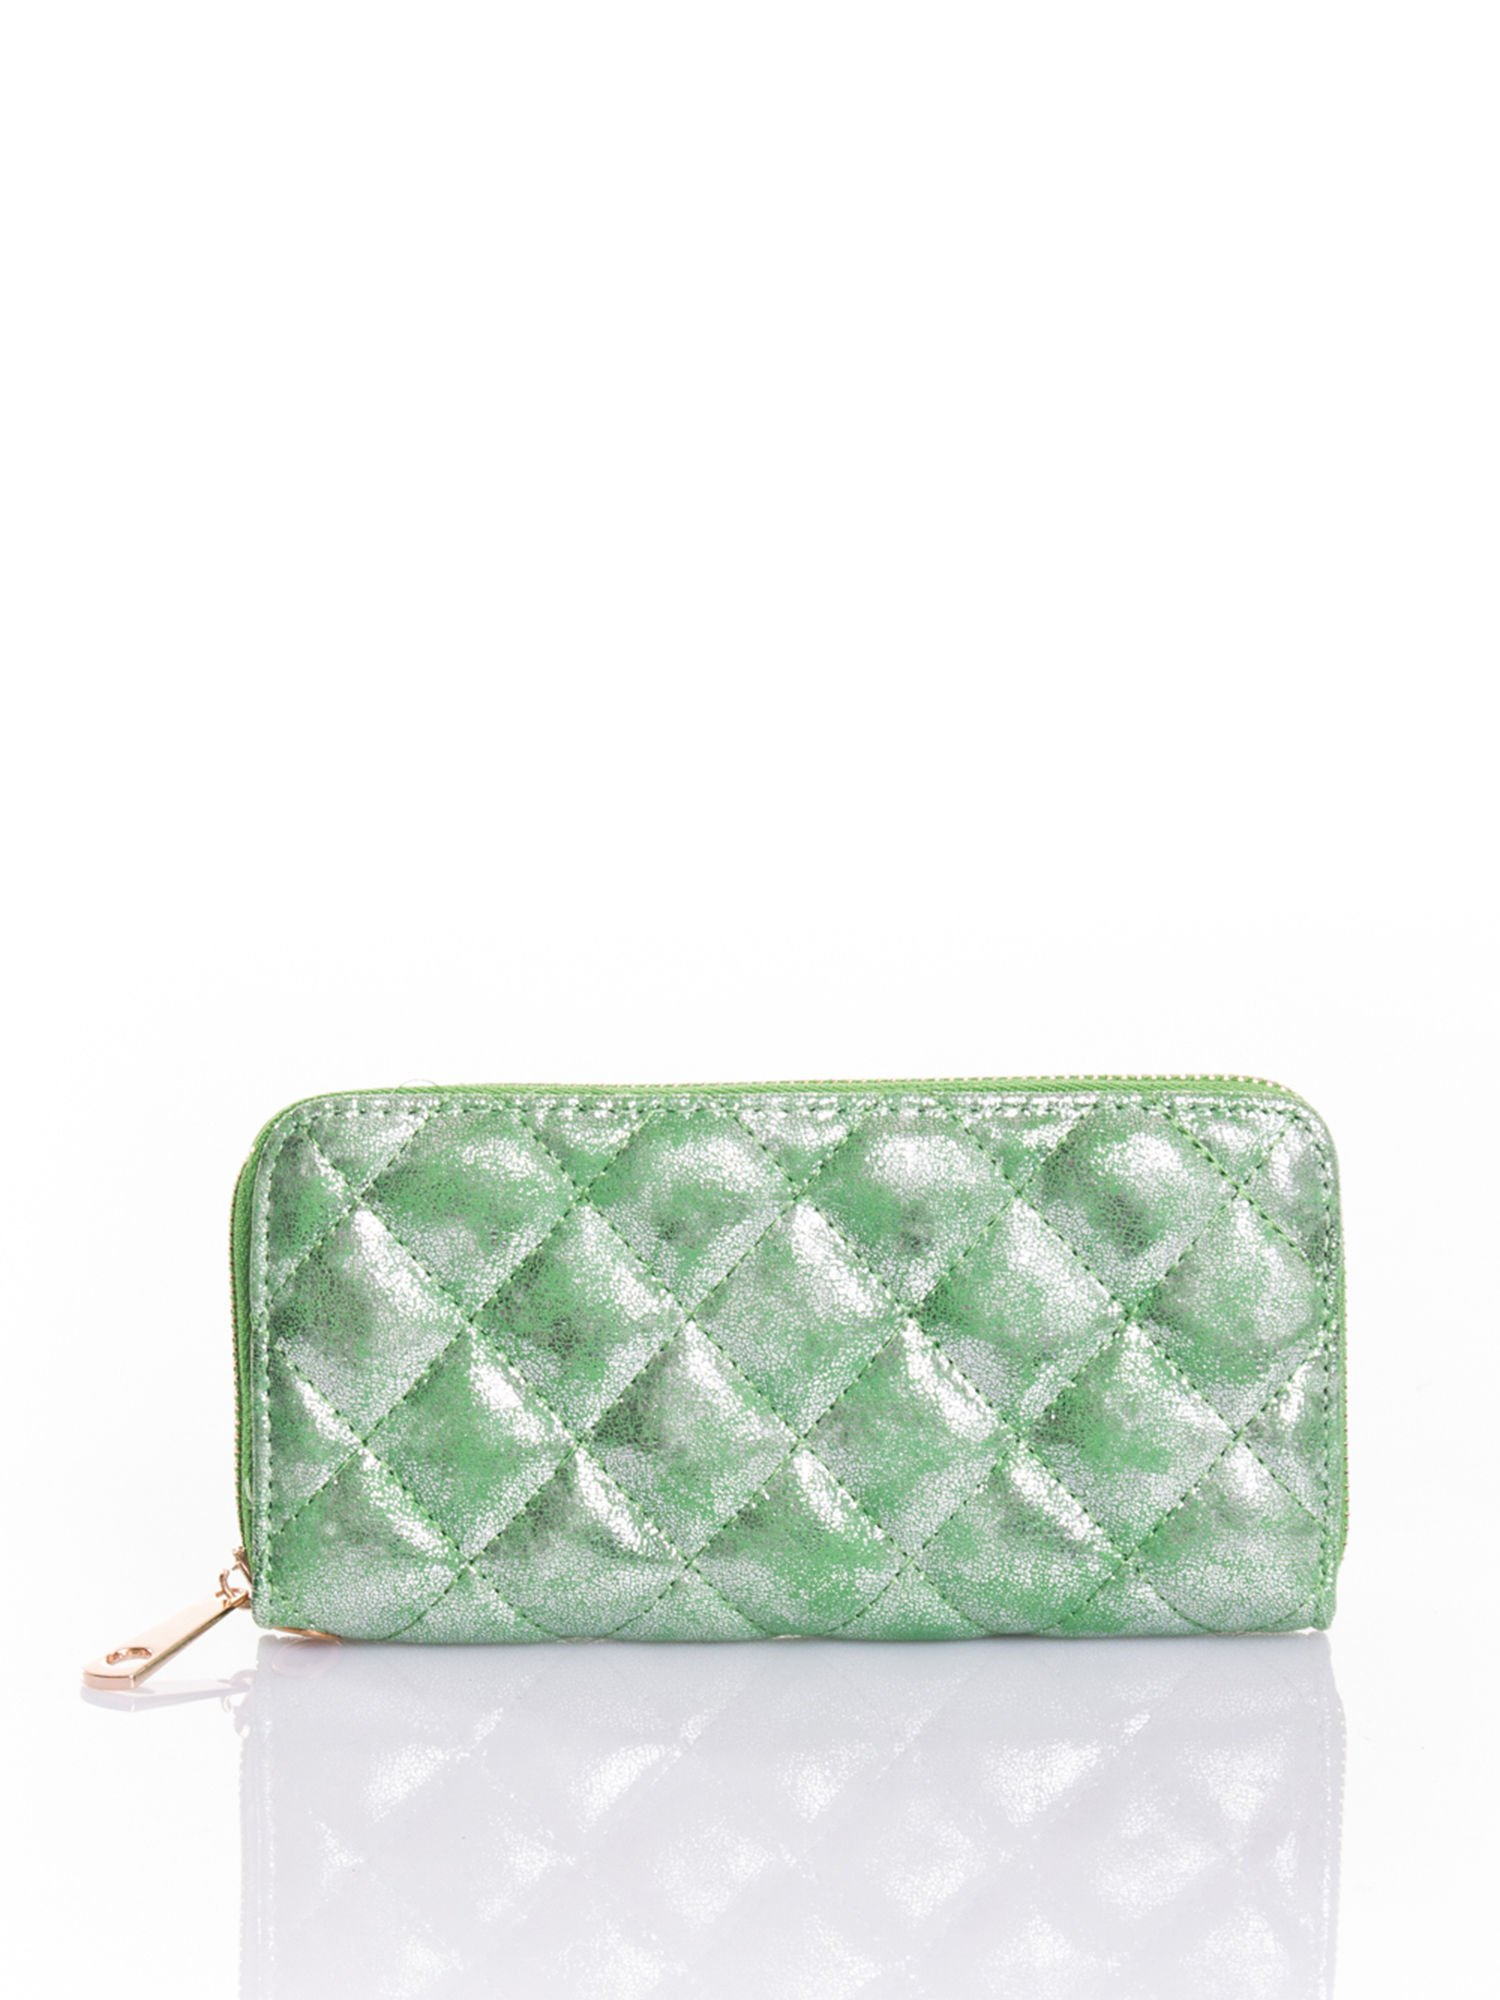 Zielony pikowany portfel                                  zdj.                                  1